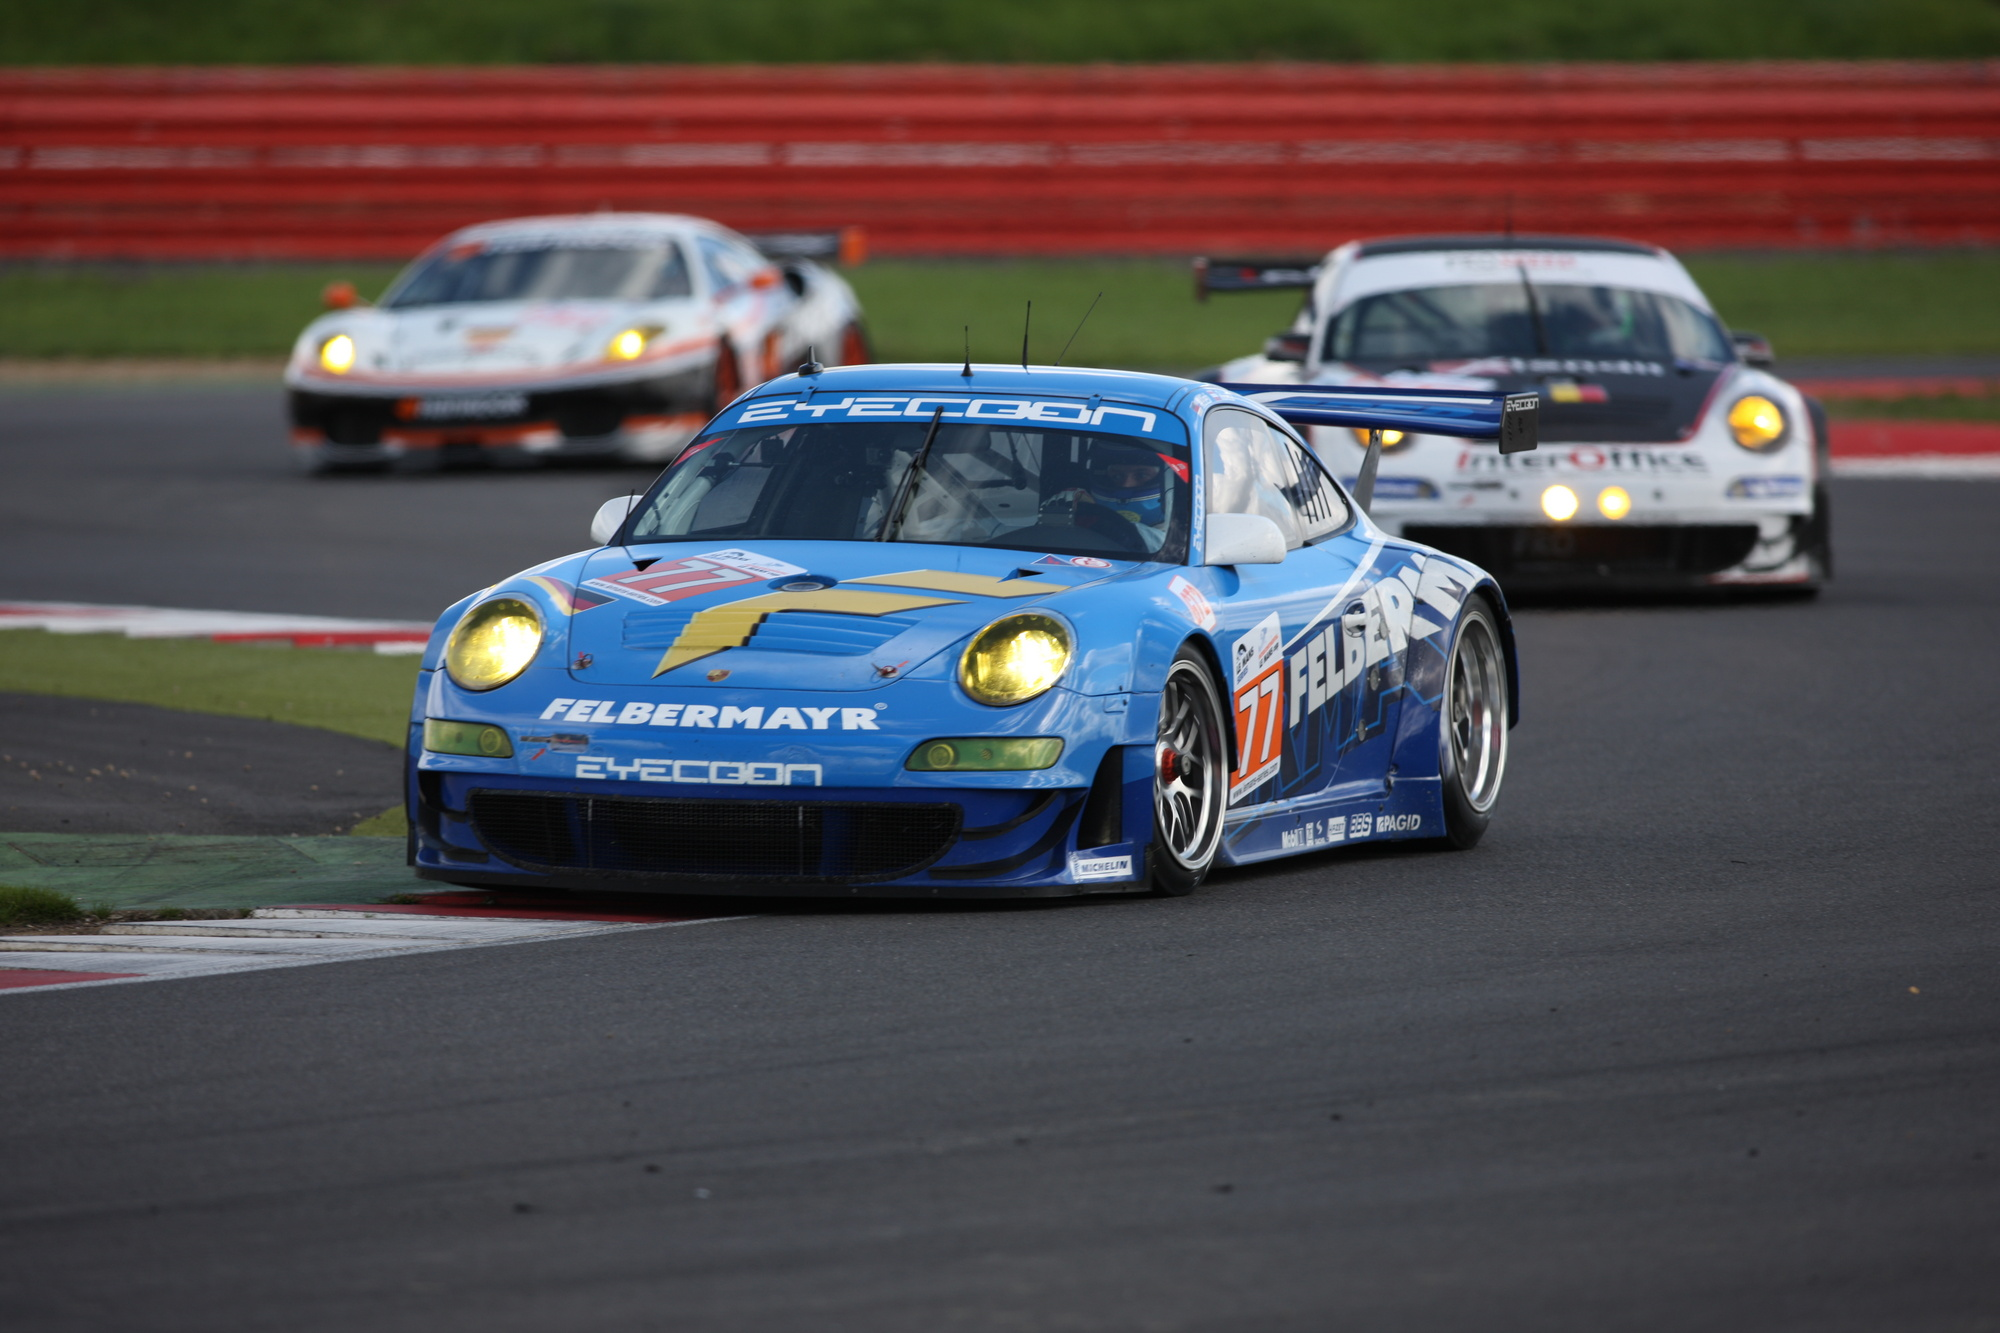 Porsche 911 Gt3 Rsr Most Successful Gt Race Car In 2010 Slideshow